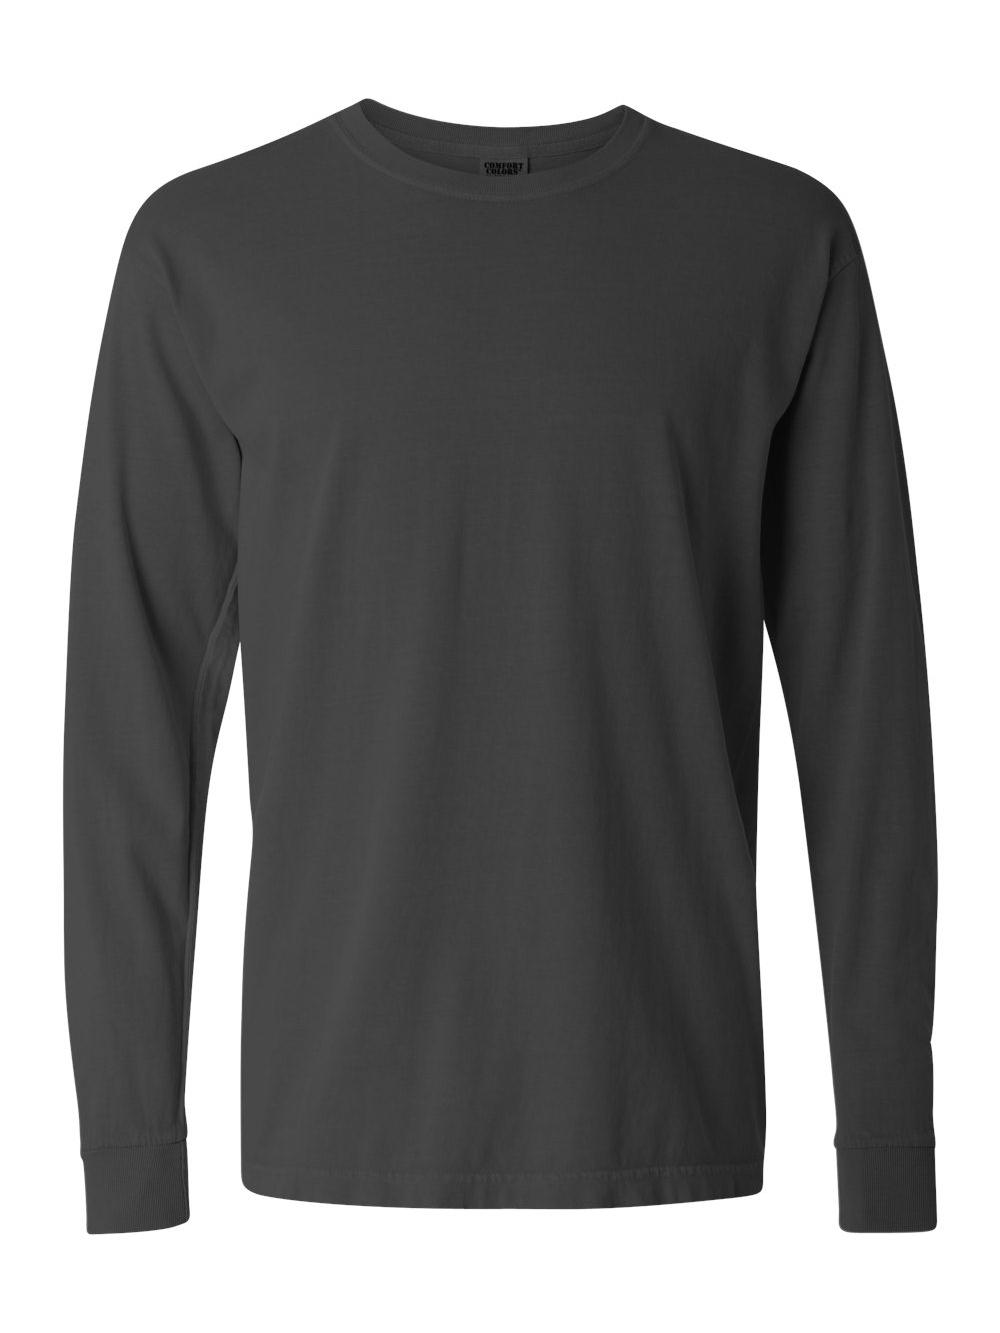 Comfort-Colors-Garment-Dyed-Heavyweight-Ringspun-Long-Sleeve-T-Shirt-6014 thumbnail 57